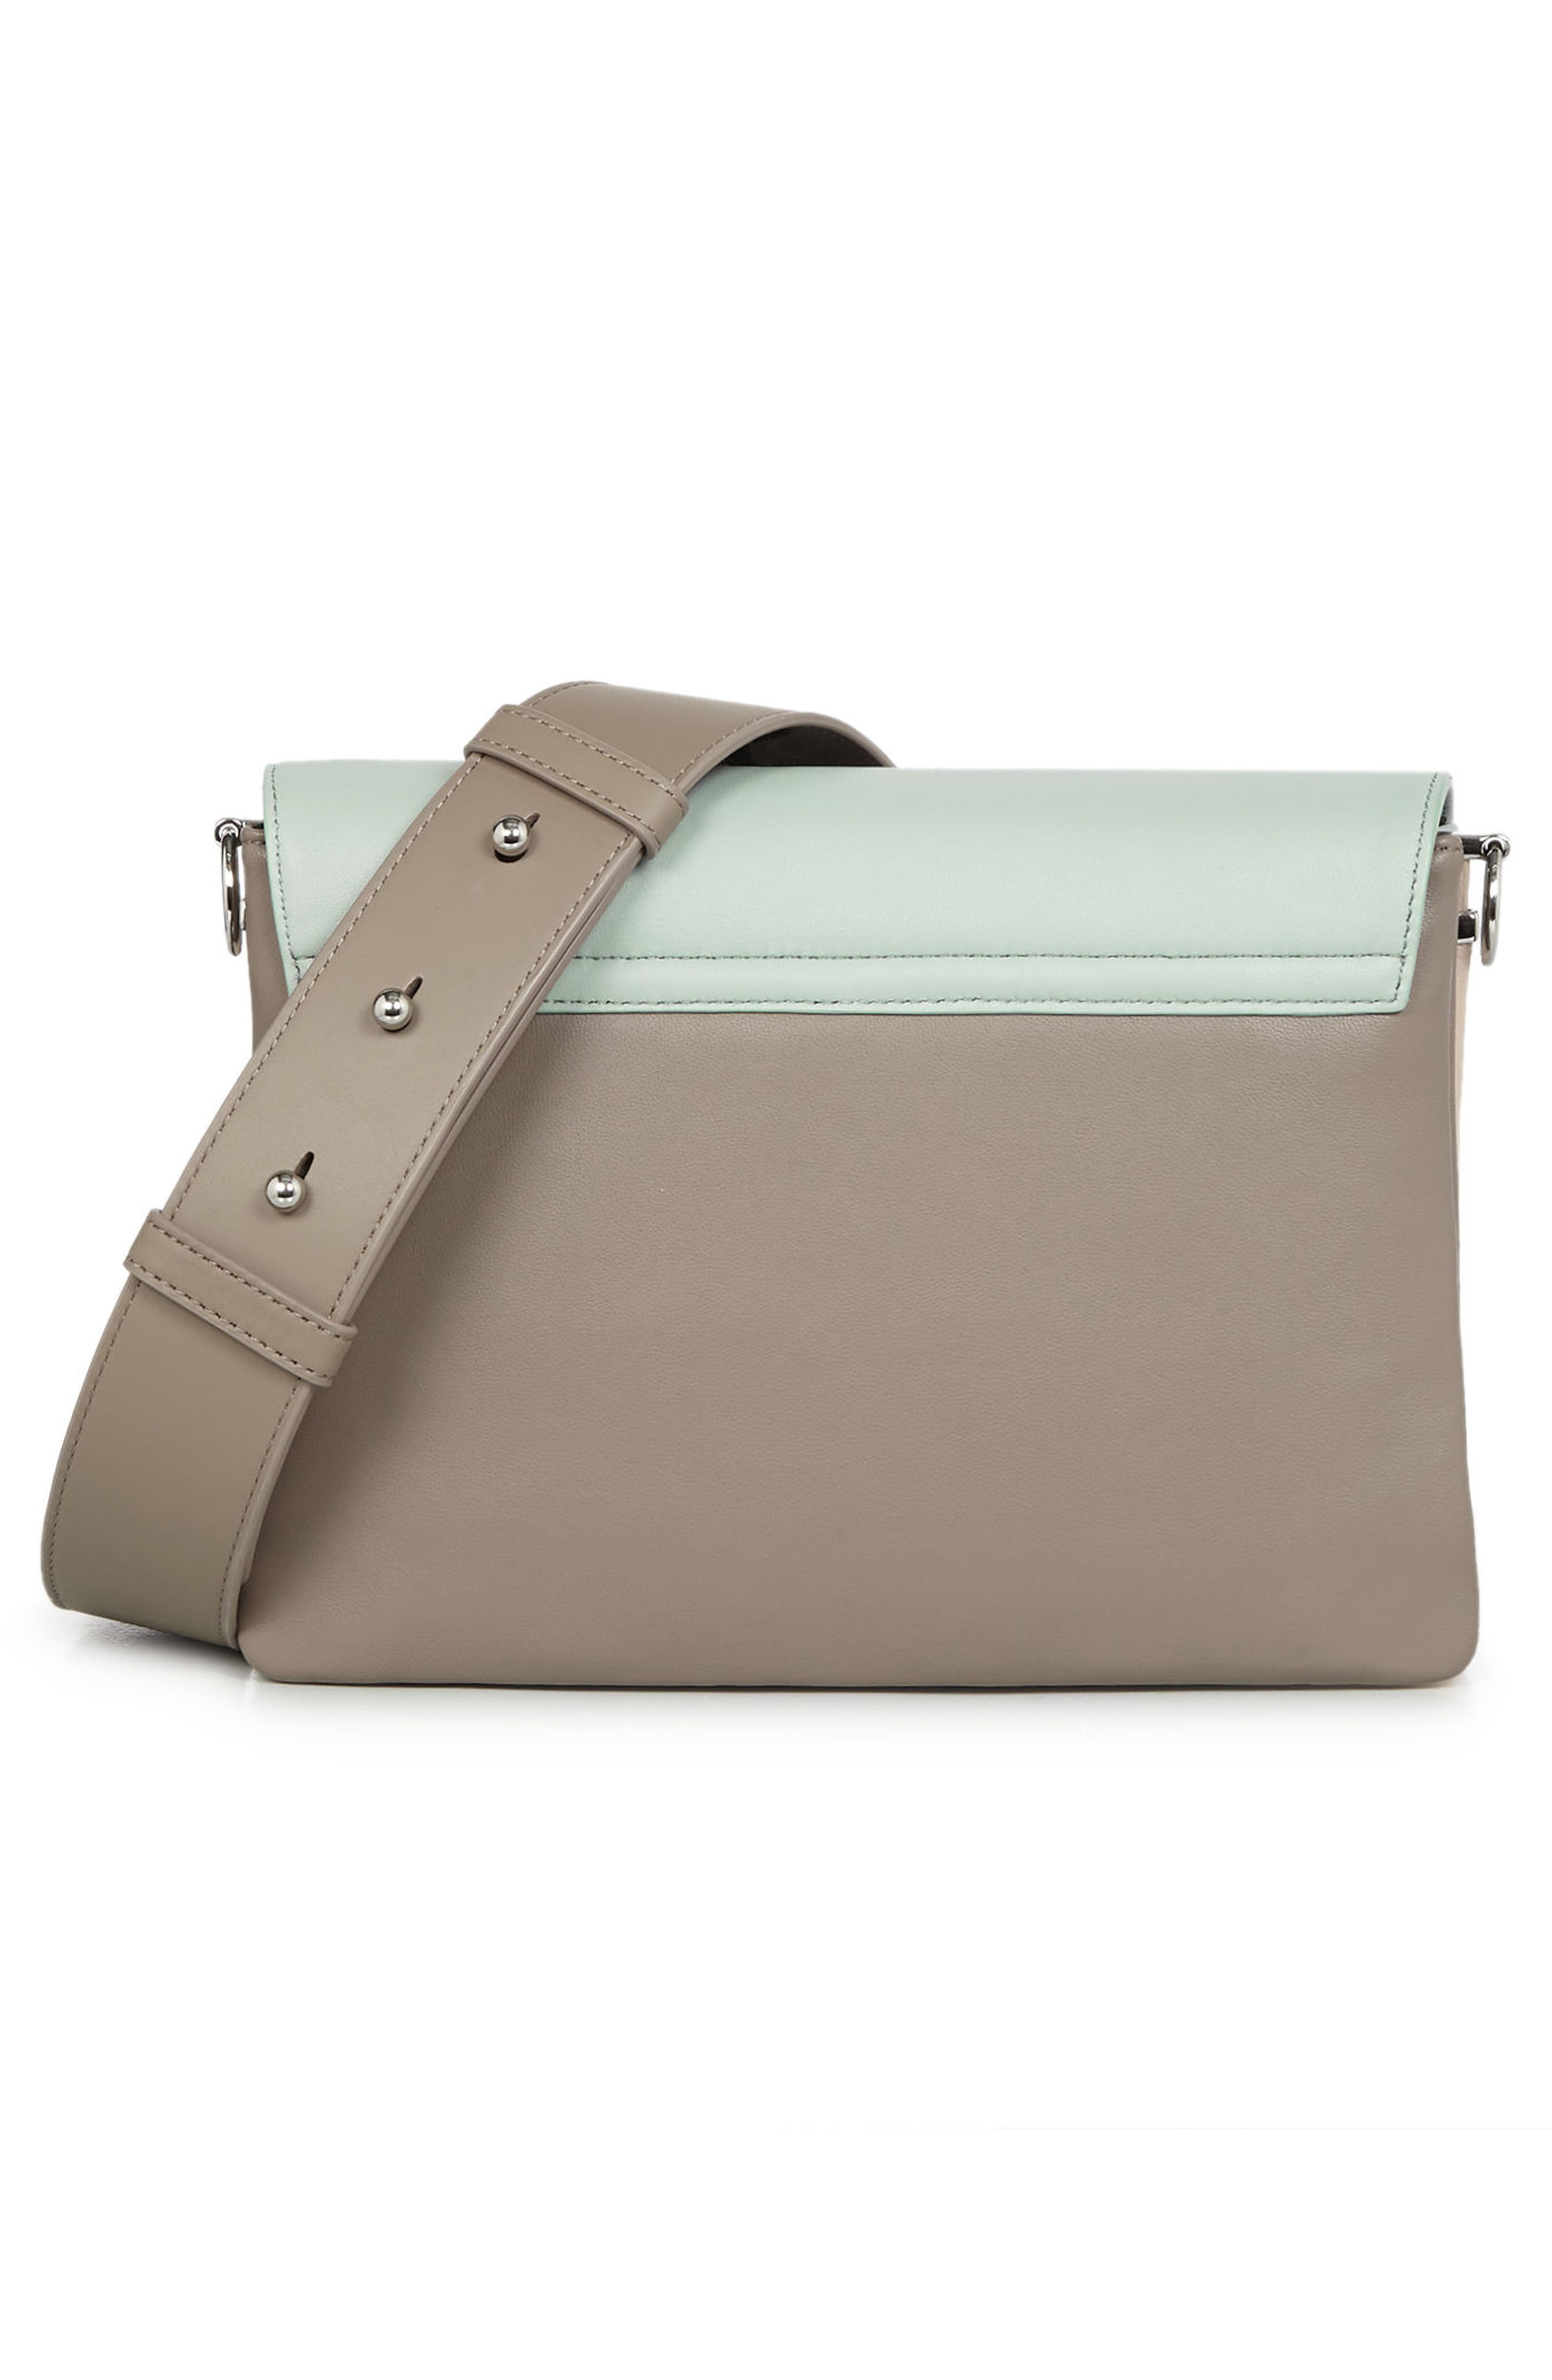 Zep Colorblock Leather Shoulder Bag,                             Alternate thumbnail 2, color,                             MINT GREEN